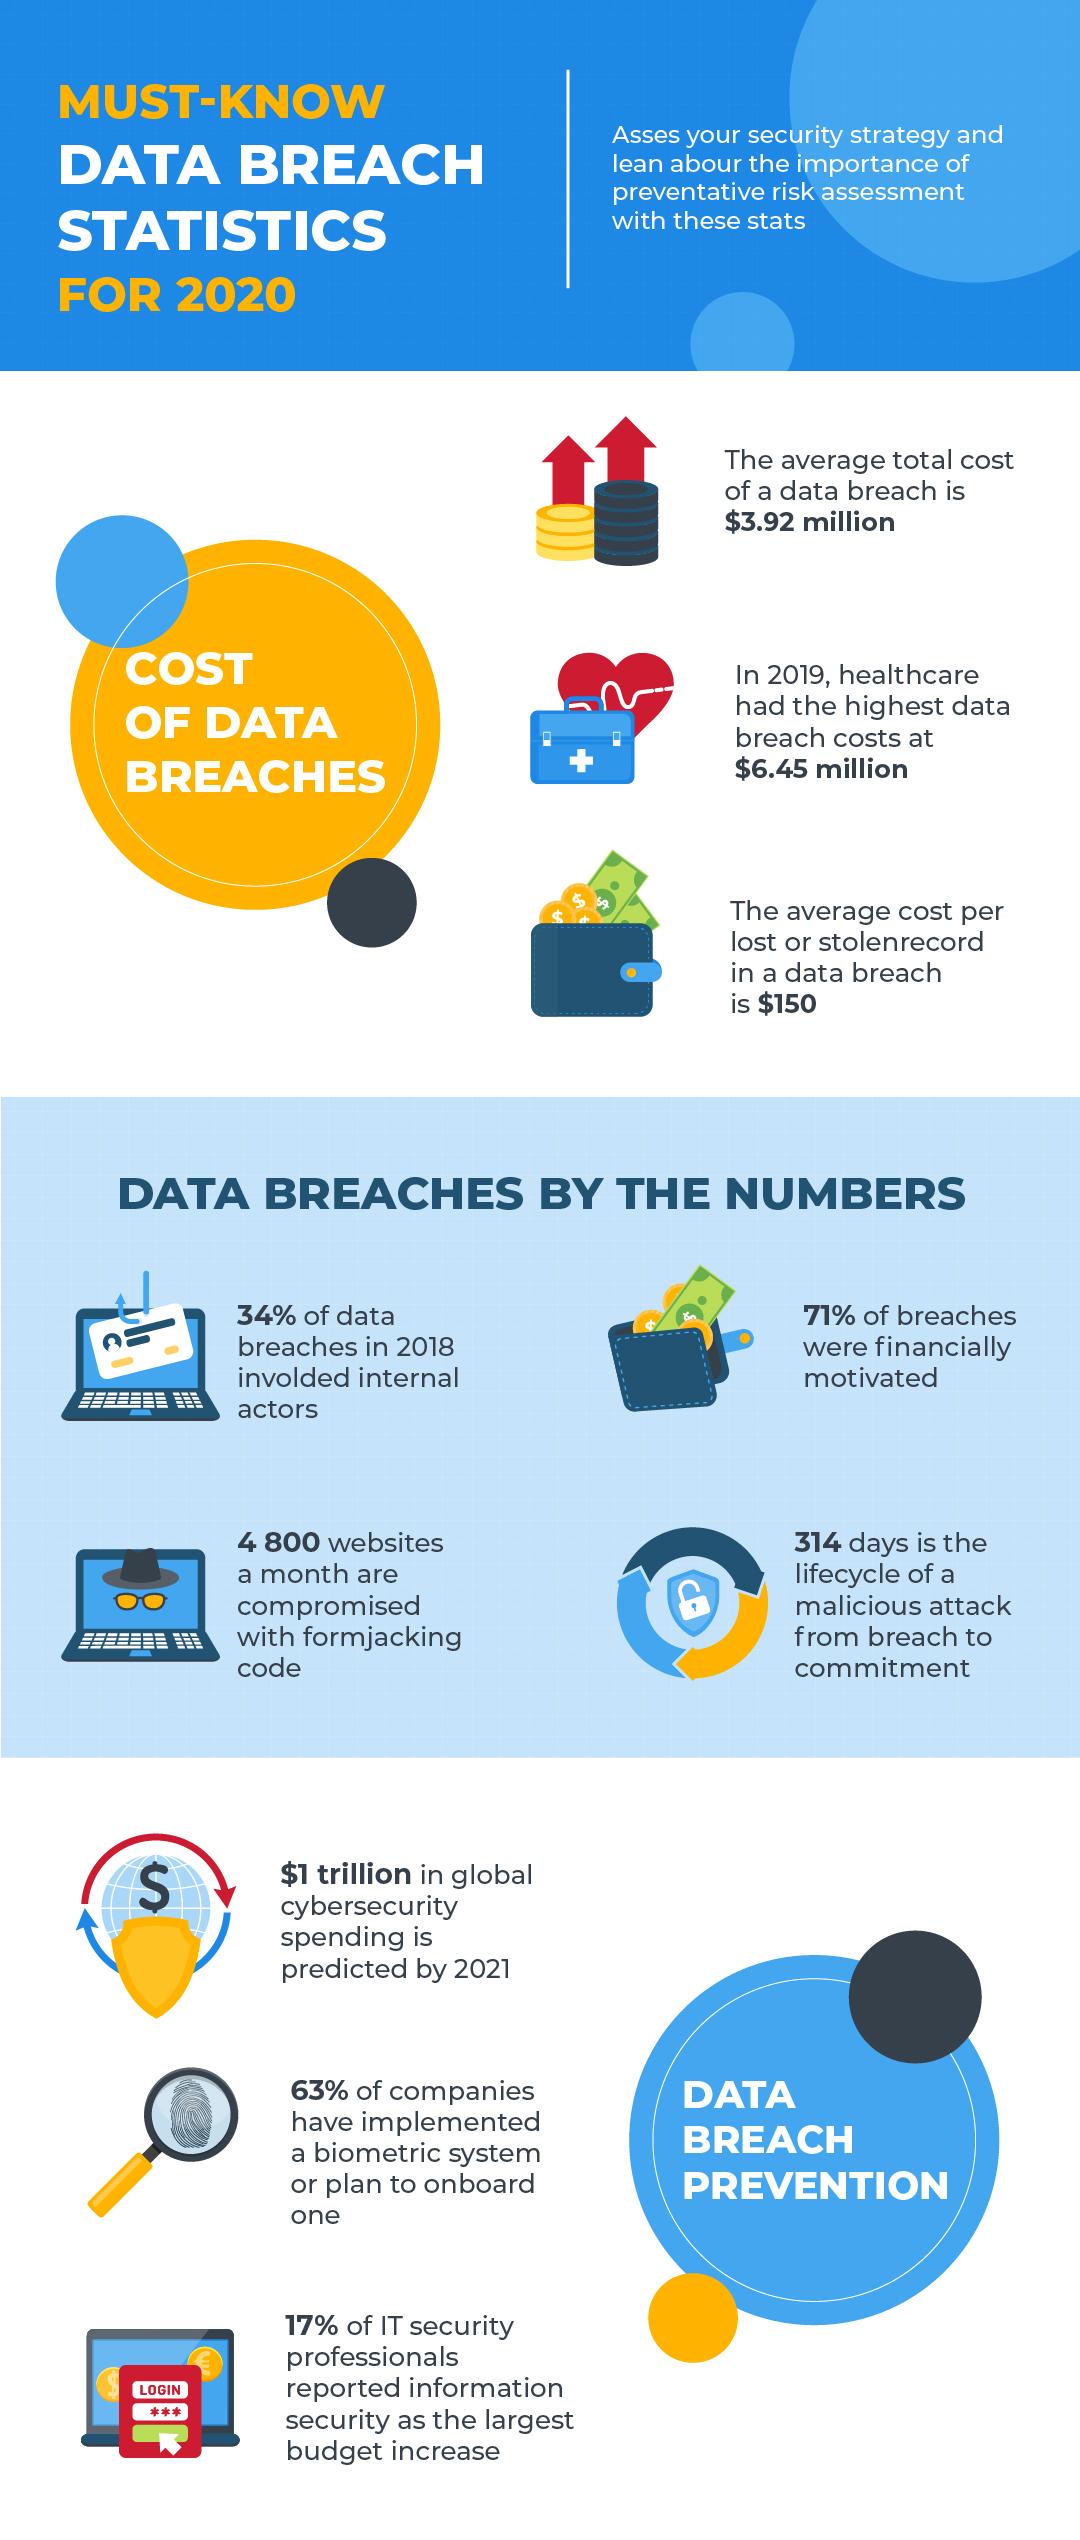 Data breach statistics for 2020